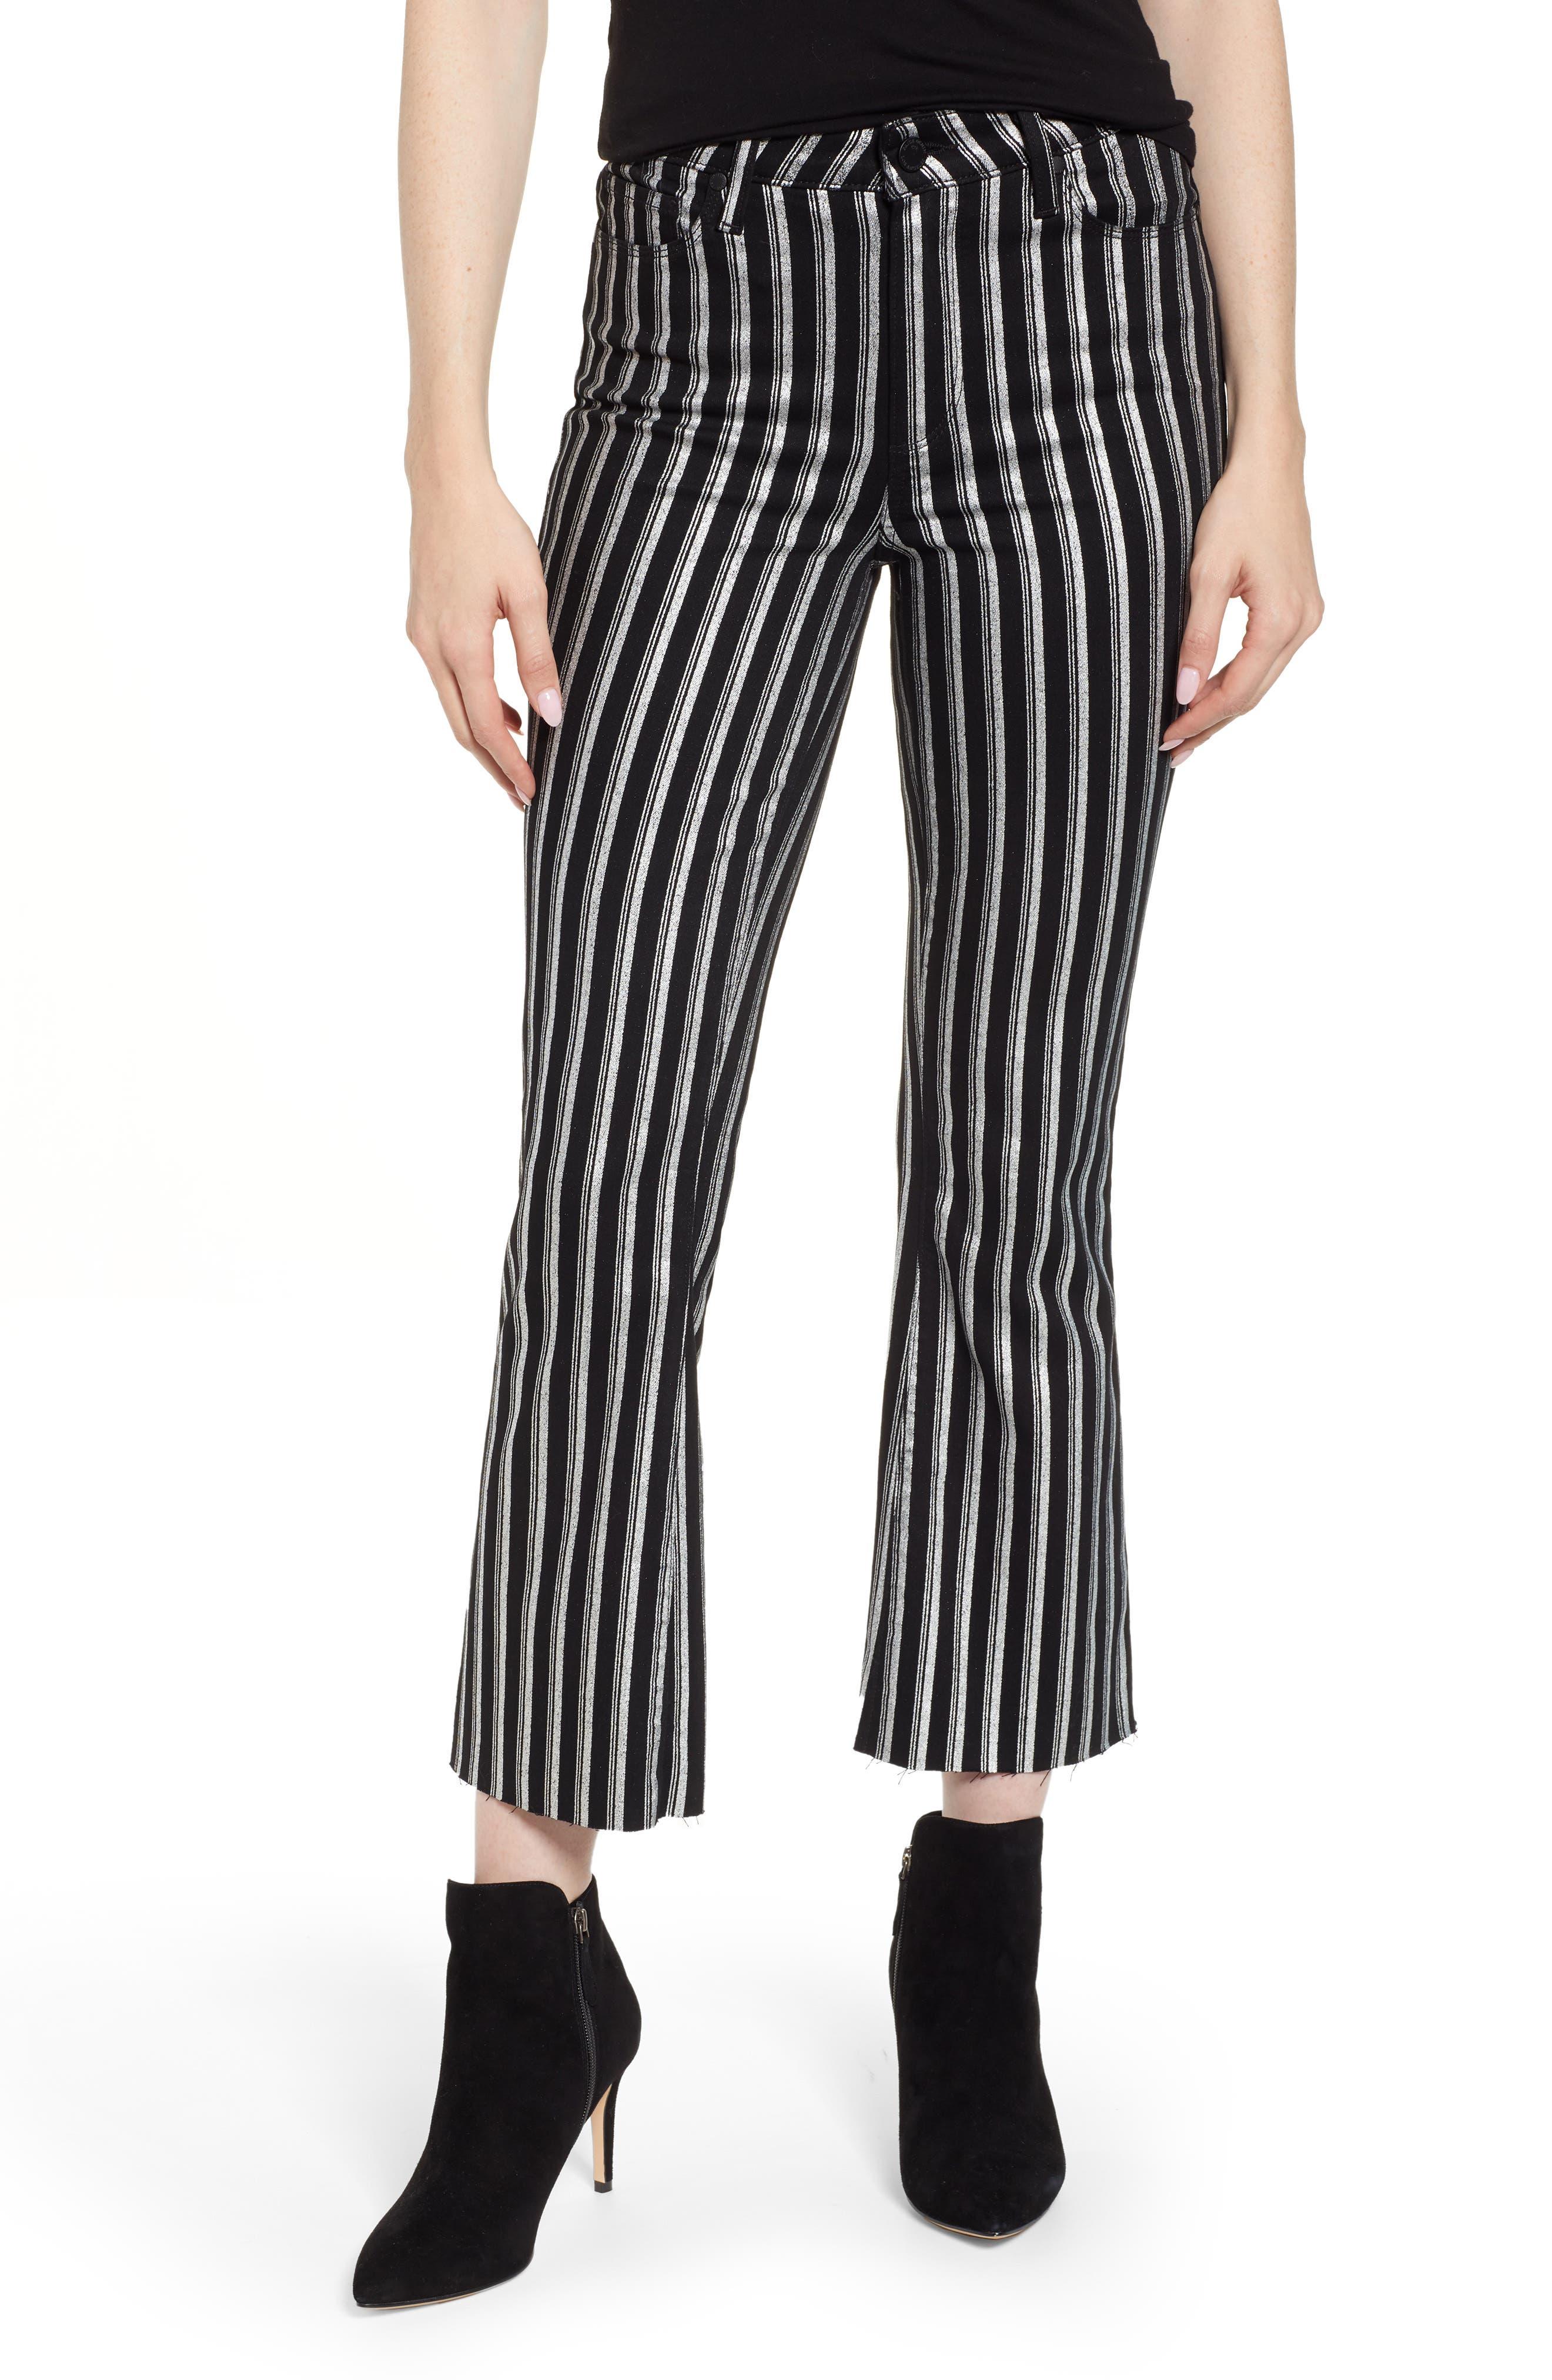 PAIGE Colette High Waist Crop Flare Jeans, Main, color, SILVER STRIPE